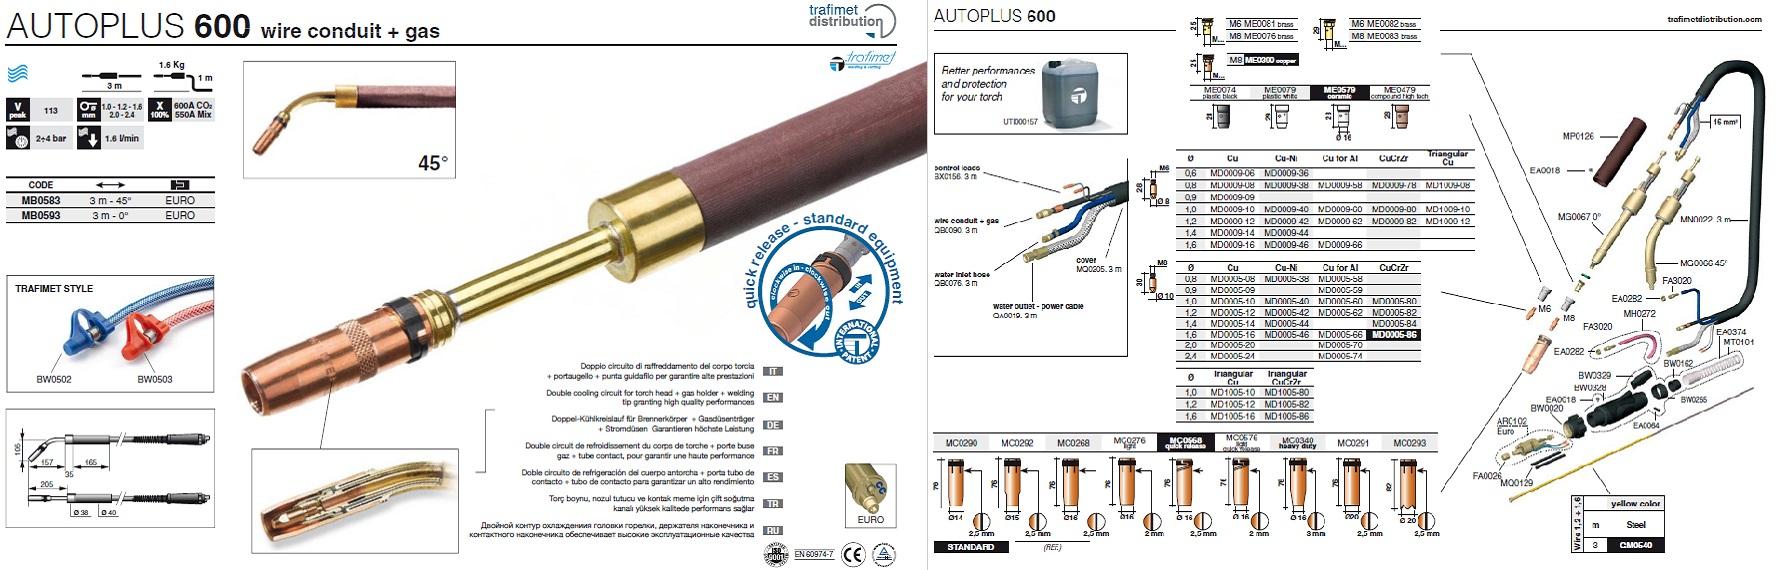 AUTOPLUS 600